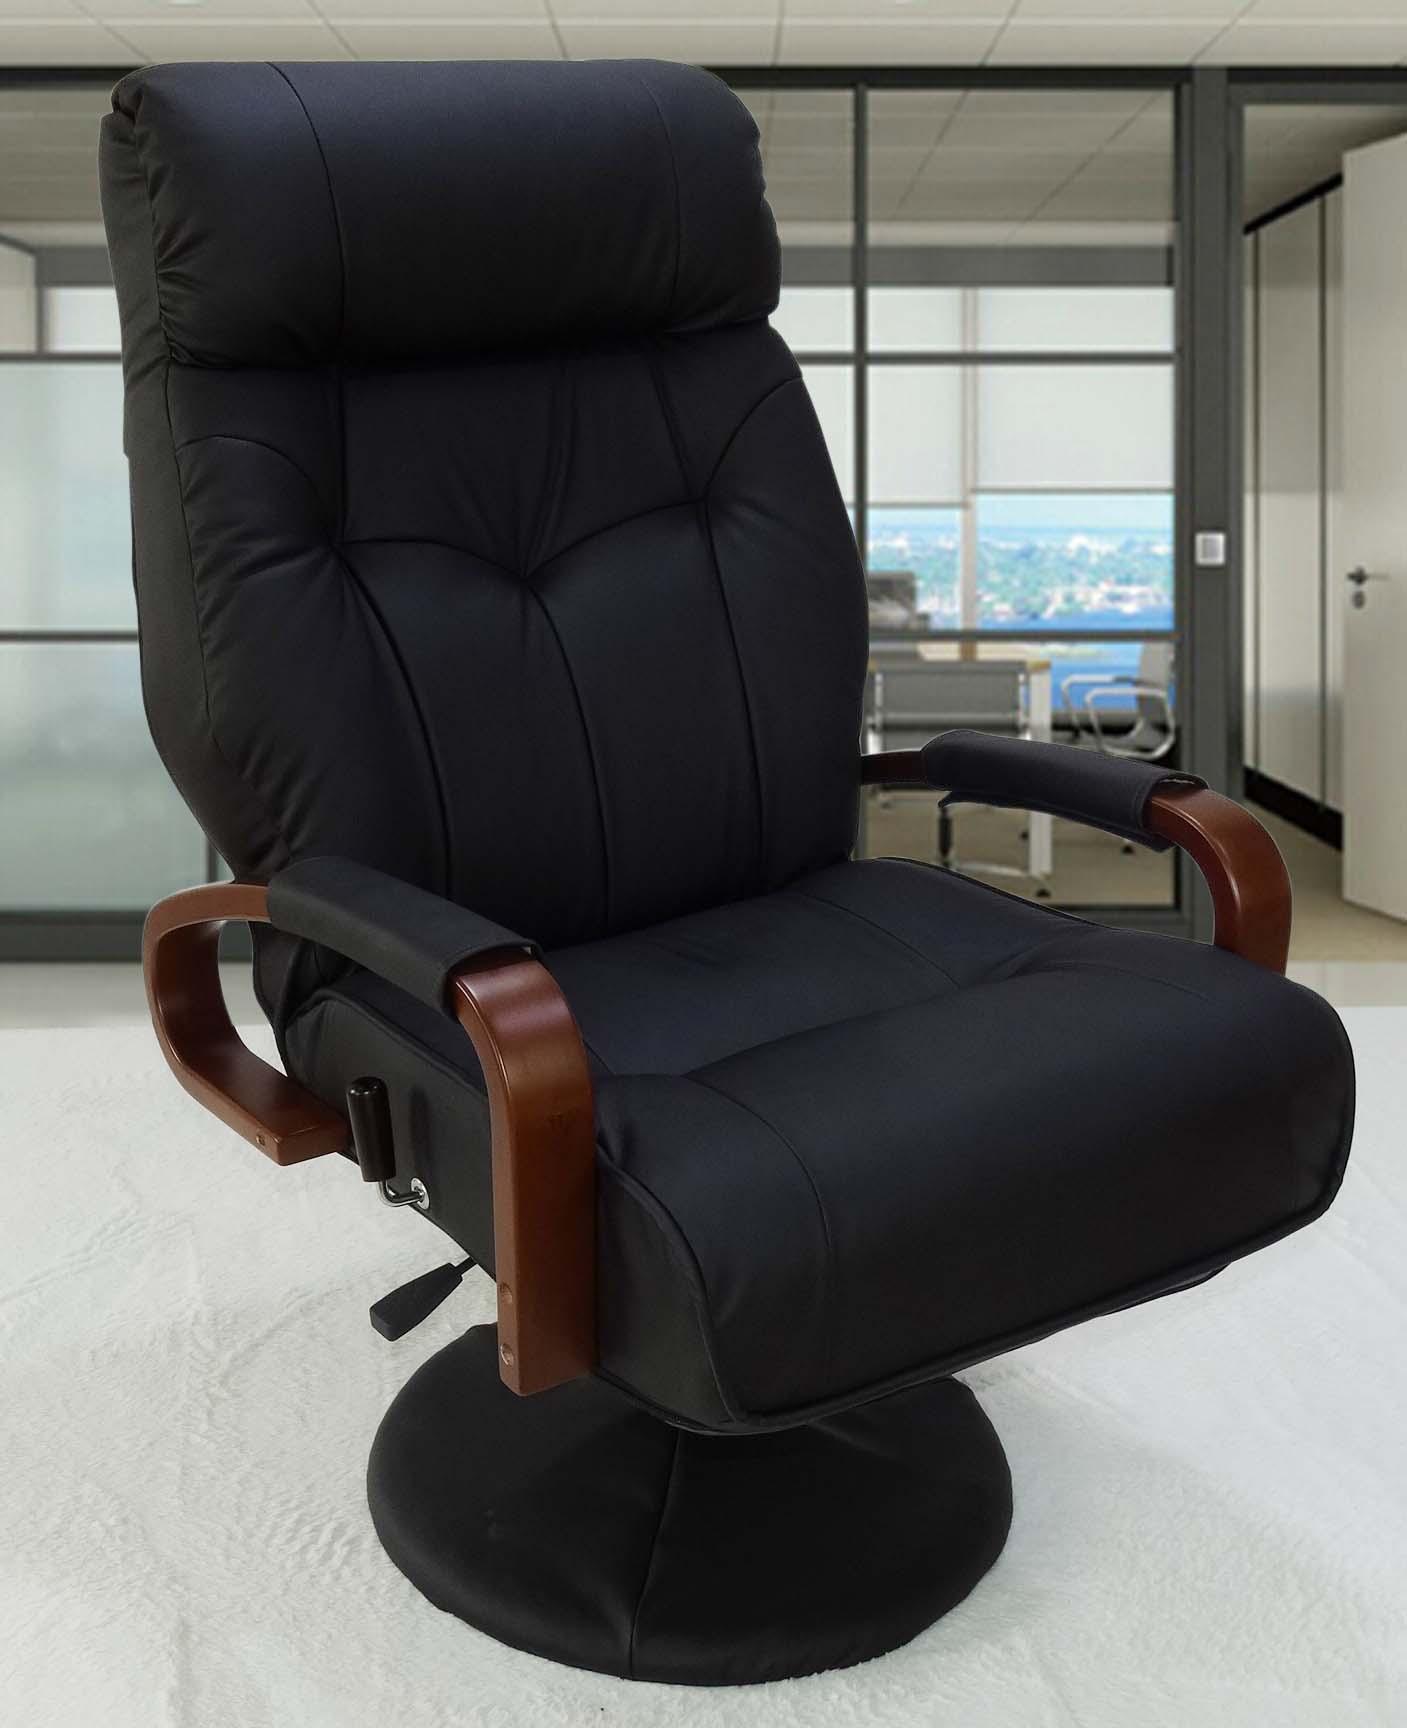 living room sofa armchair 360 swivel lift chair recliners for elderly